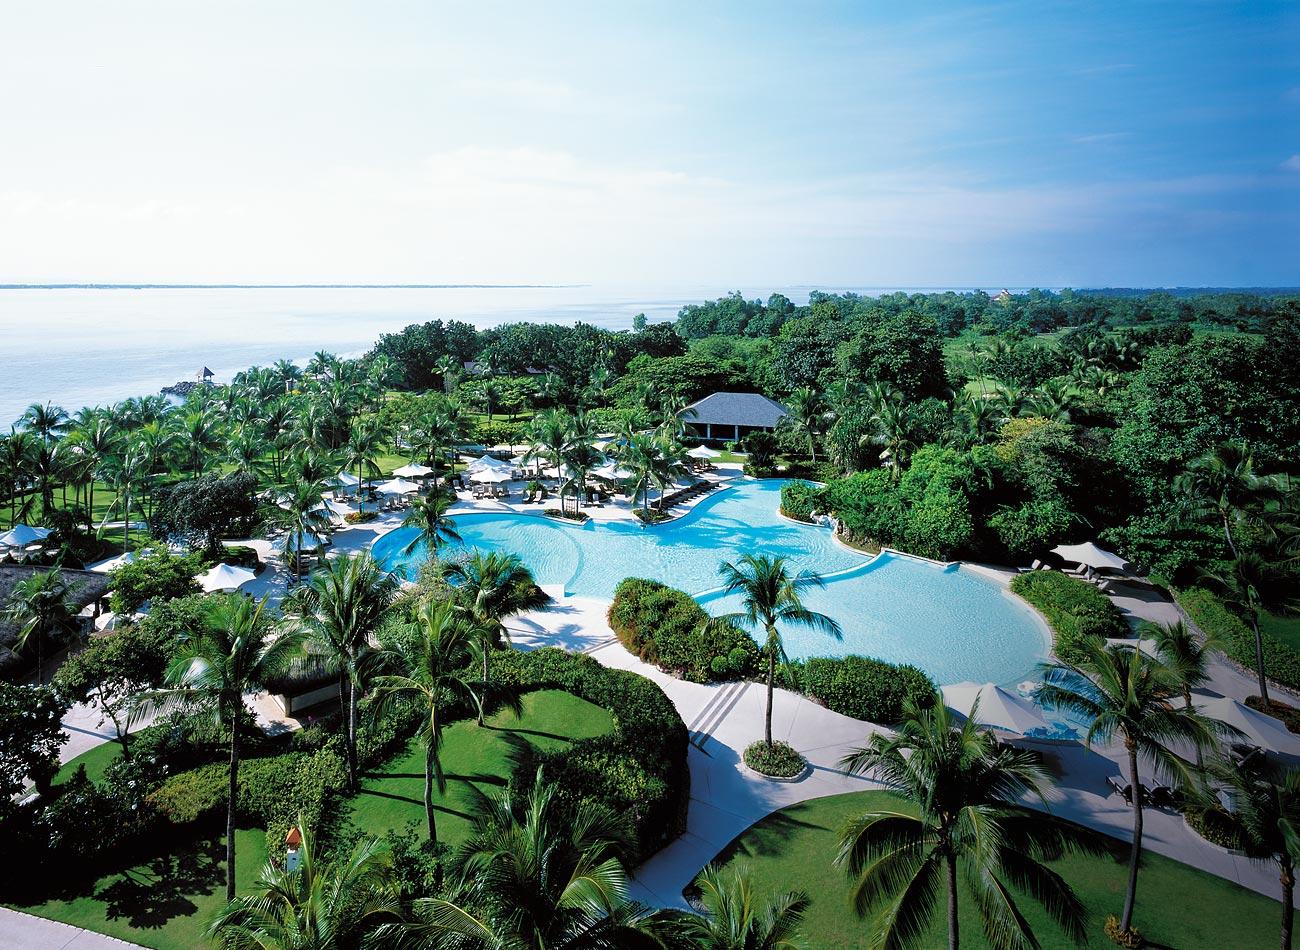 MAC-Bg-Outdoor-Swimming-Pool